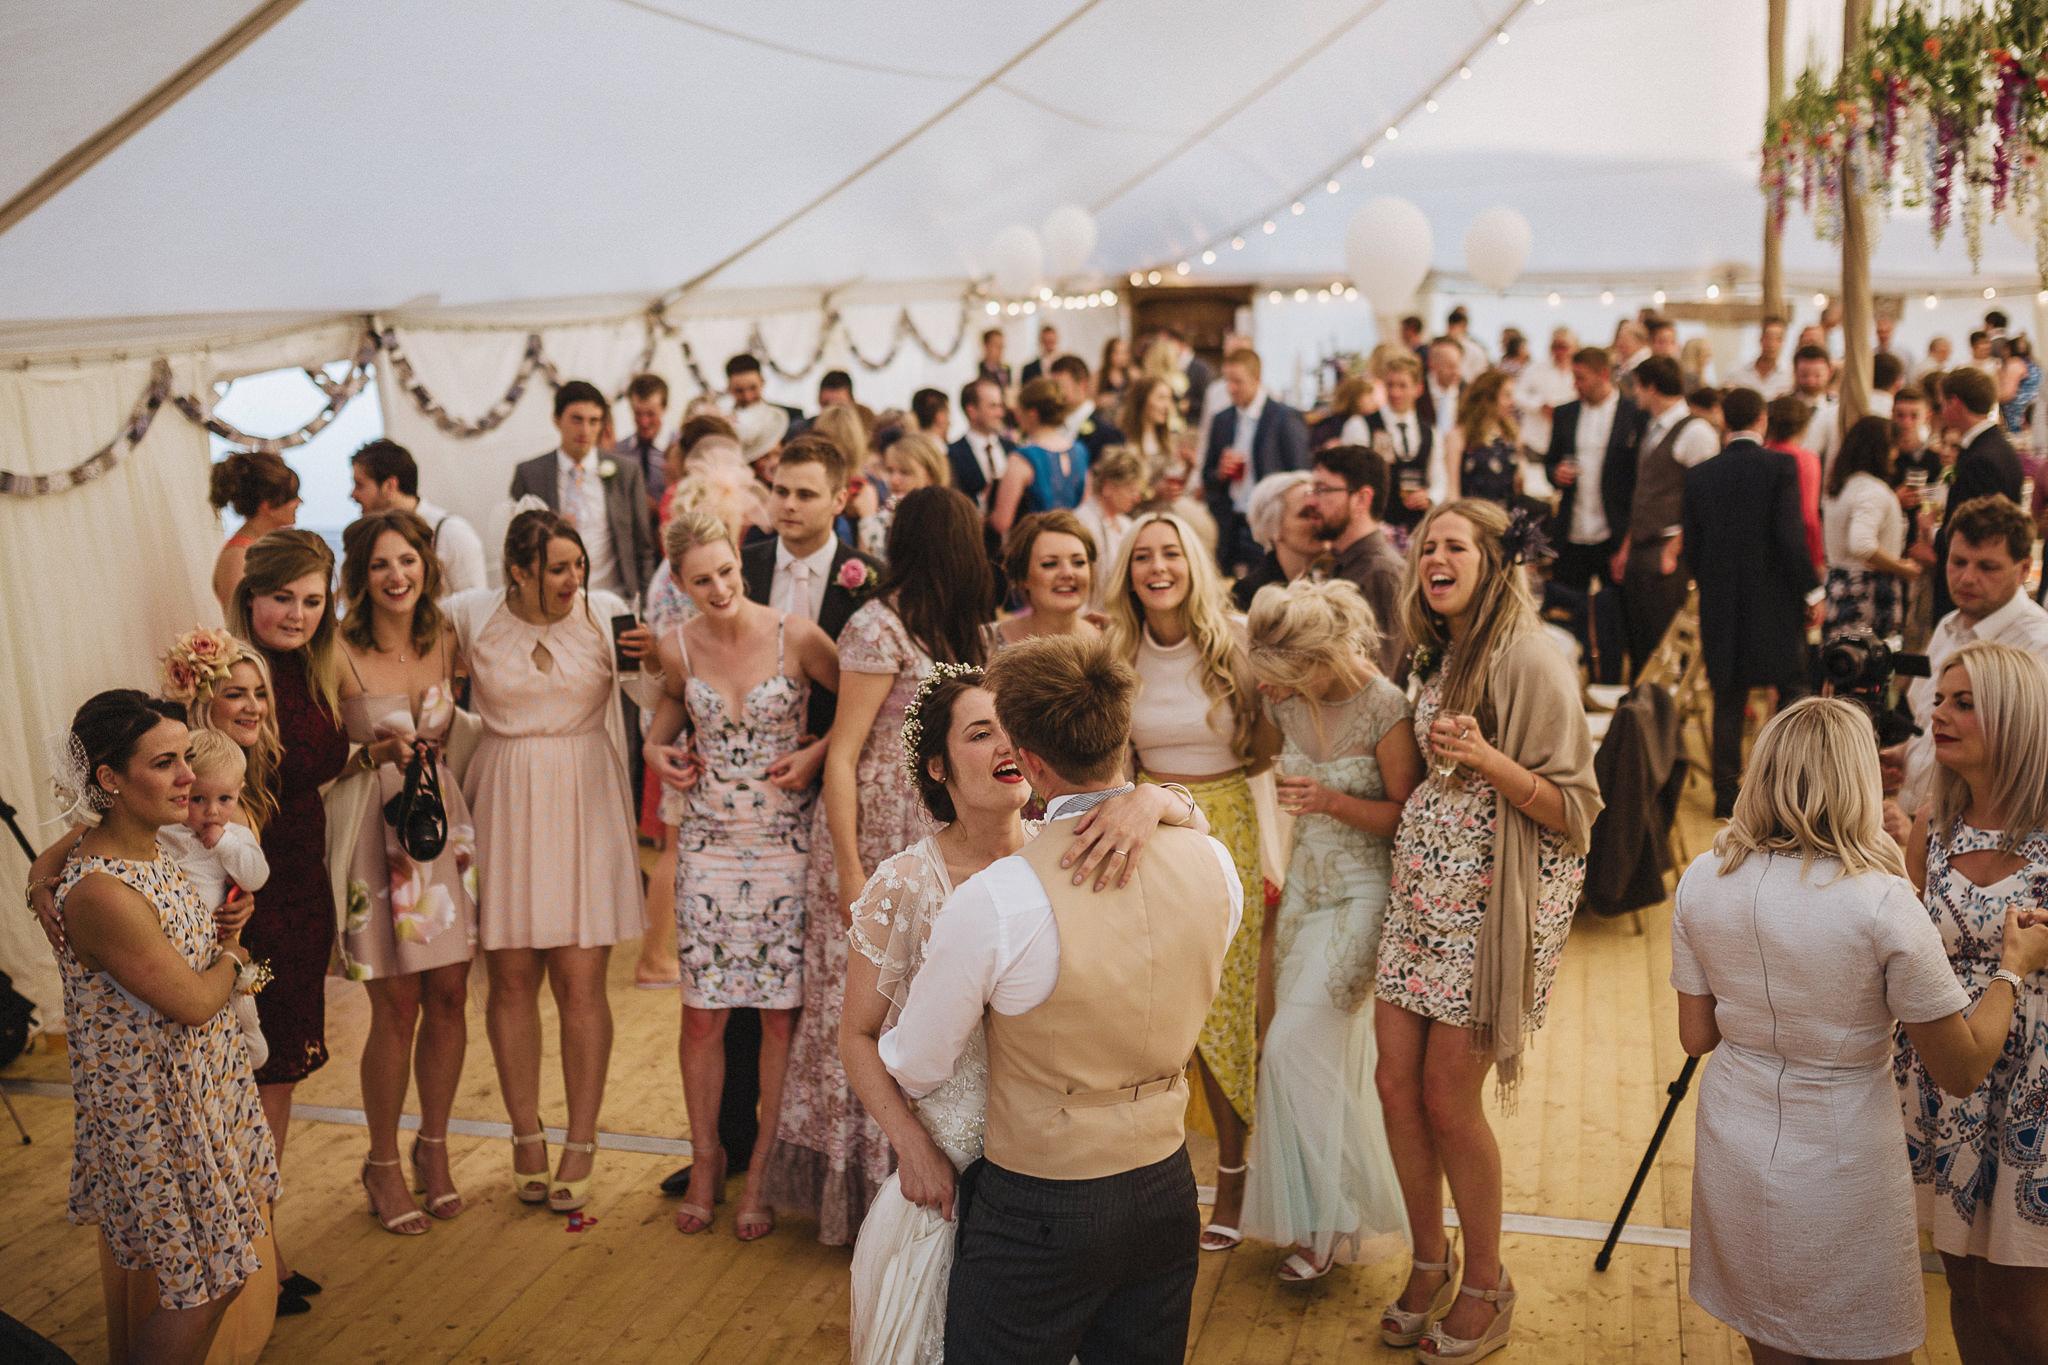 paul-marbrook-Farm-Wedding-Photographer-Lancashire-90089